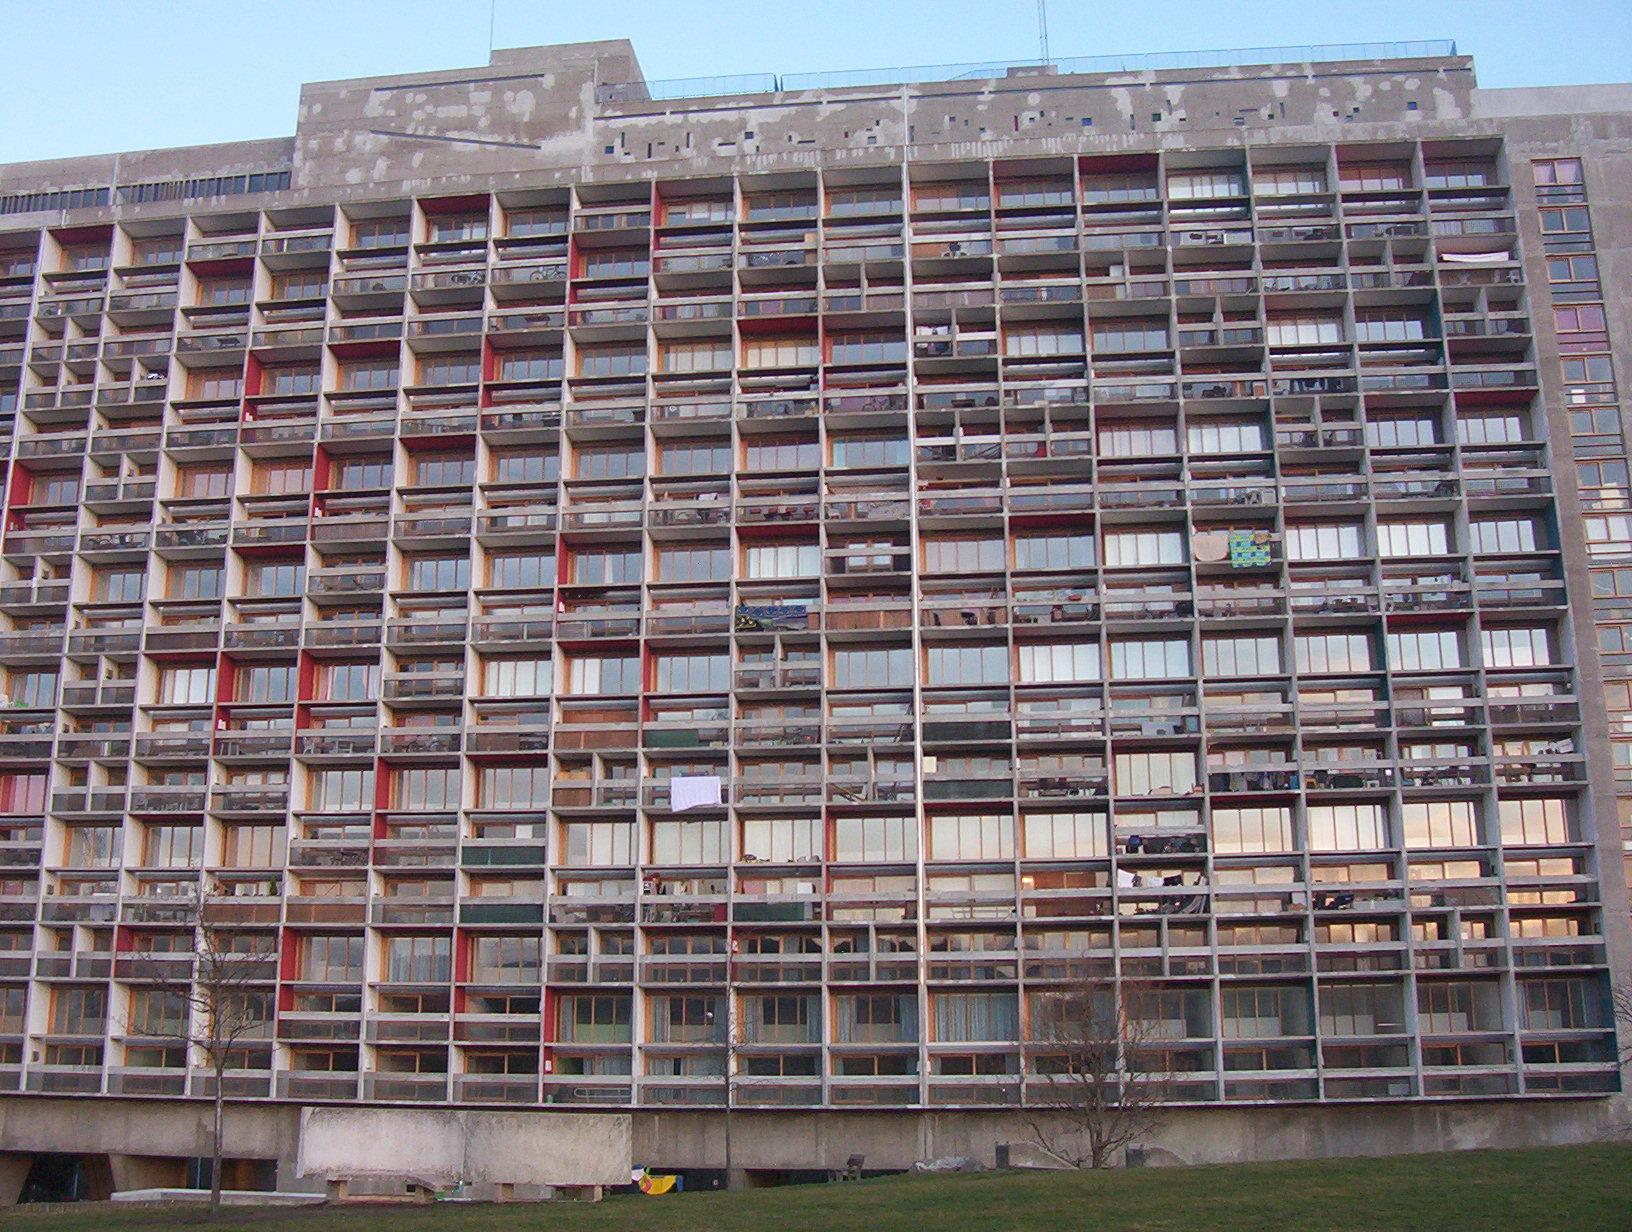 Unit d 39 habitation de firminy vert - Unite d habitation dimensions ...